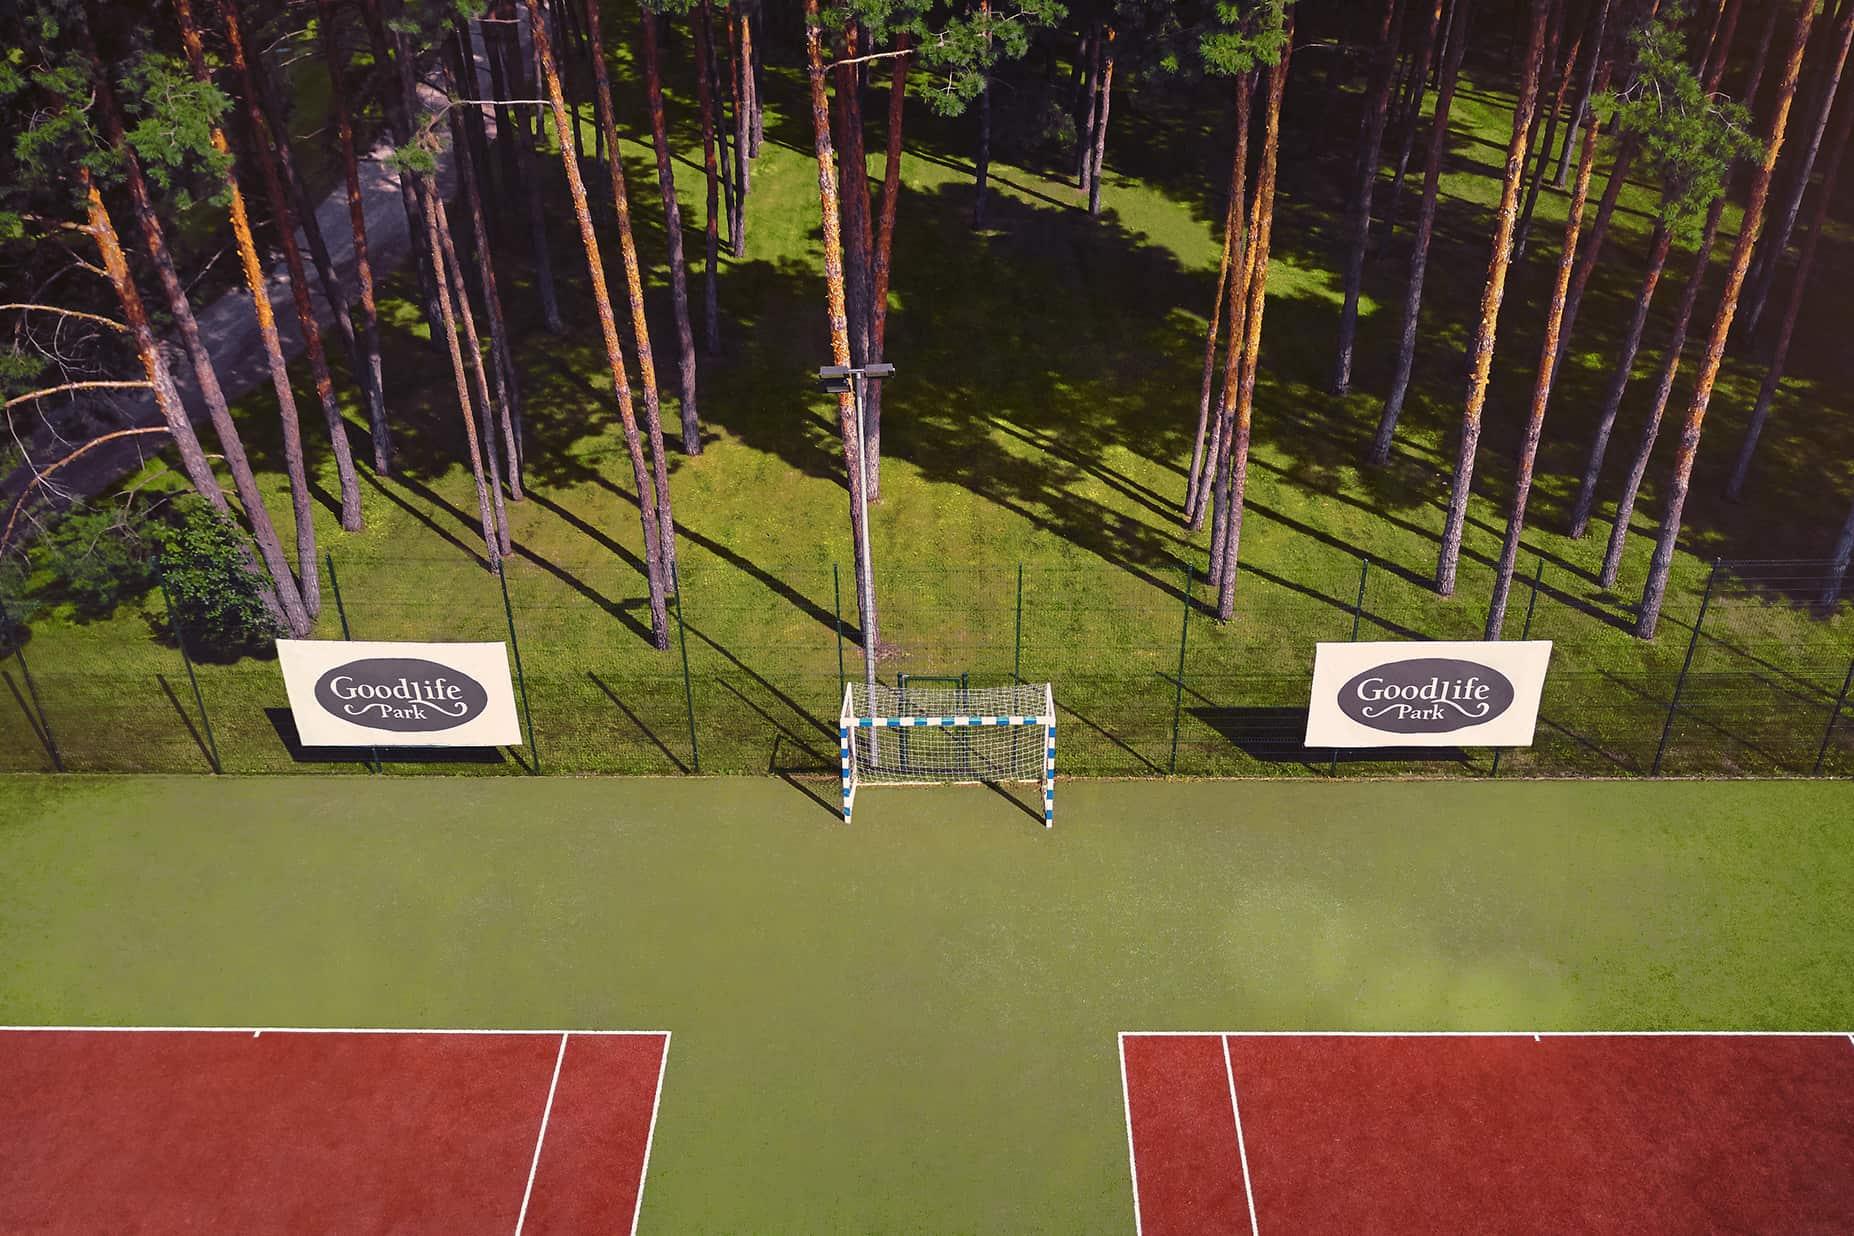 GoodLife Park tennis court